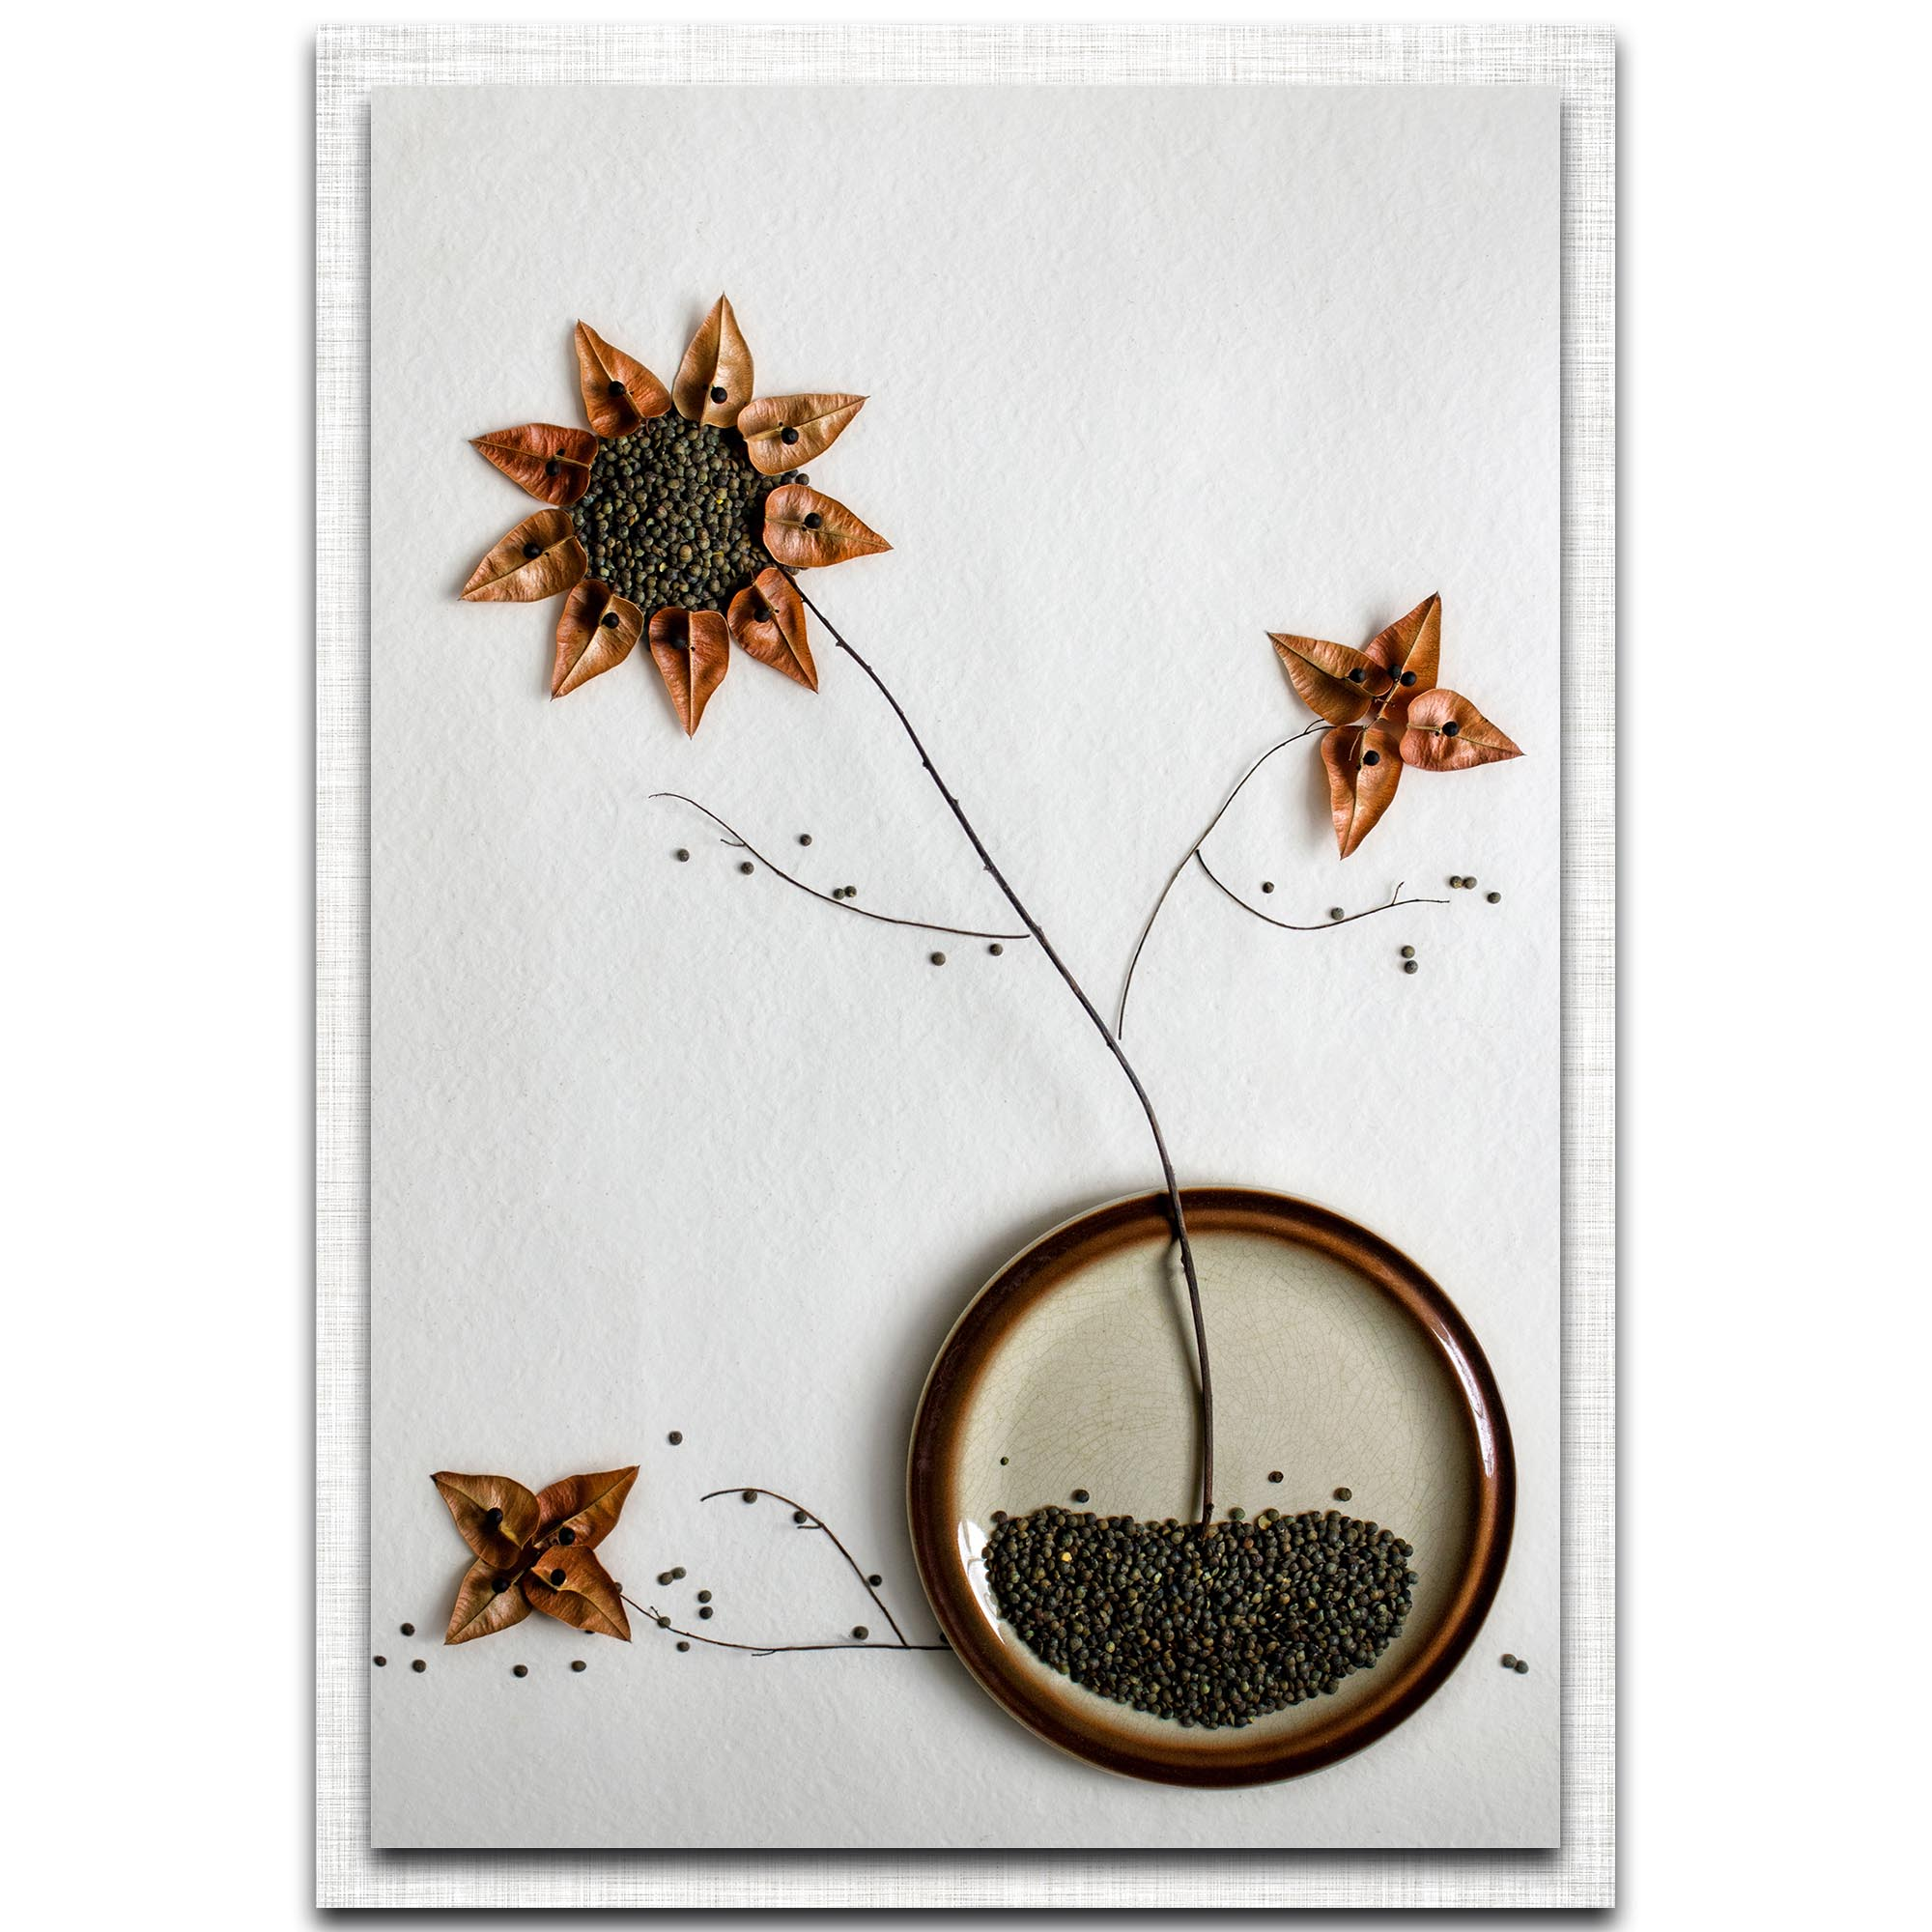 Dimitar Lazarov 'Herbarium' 22in x 32in Modern Farmhouse Floral on Metal